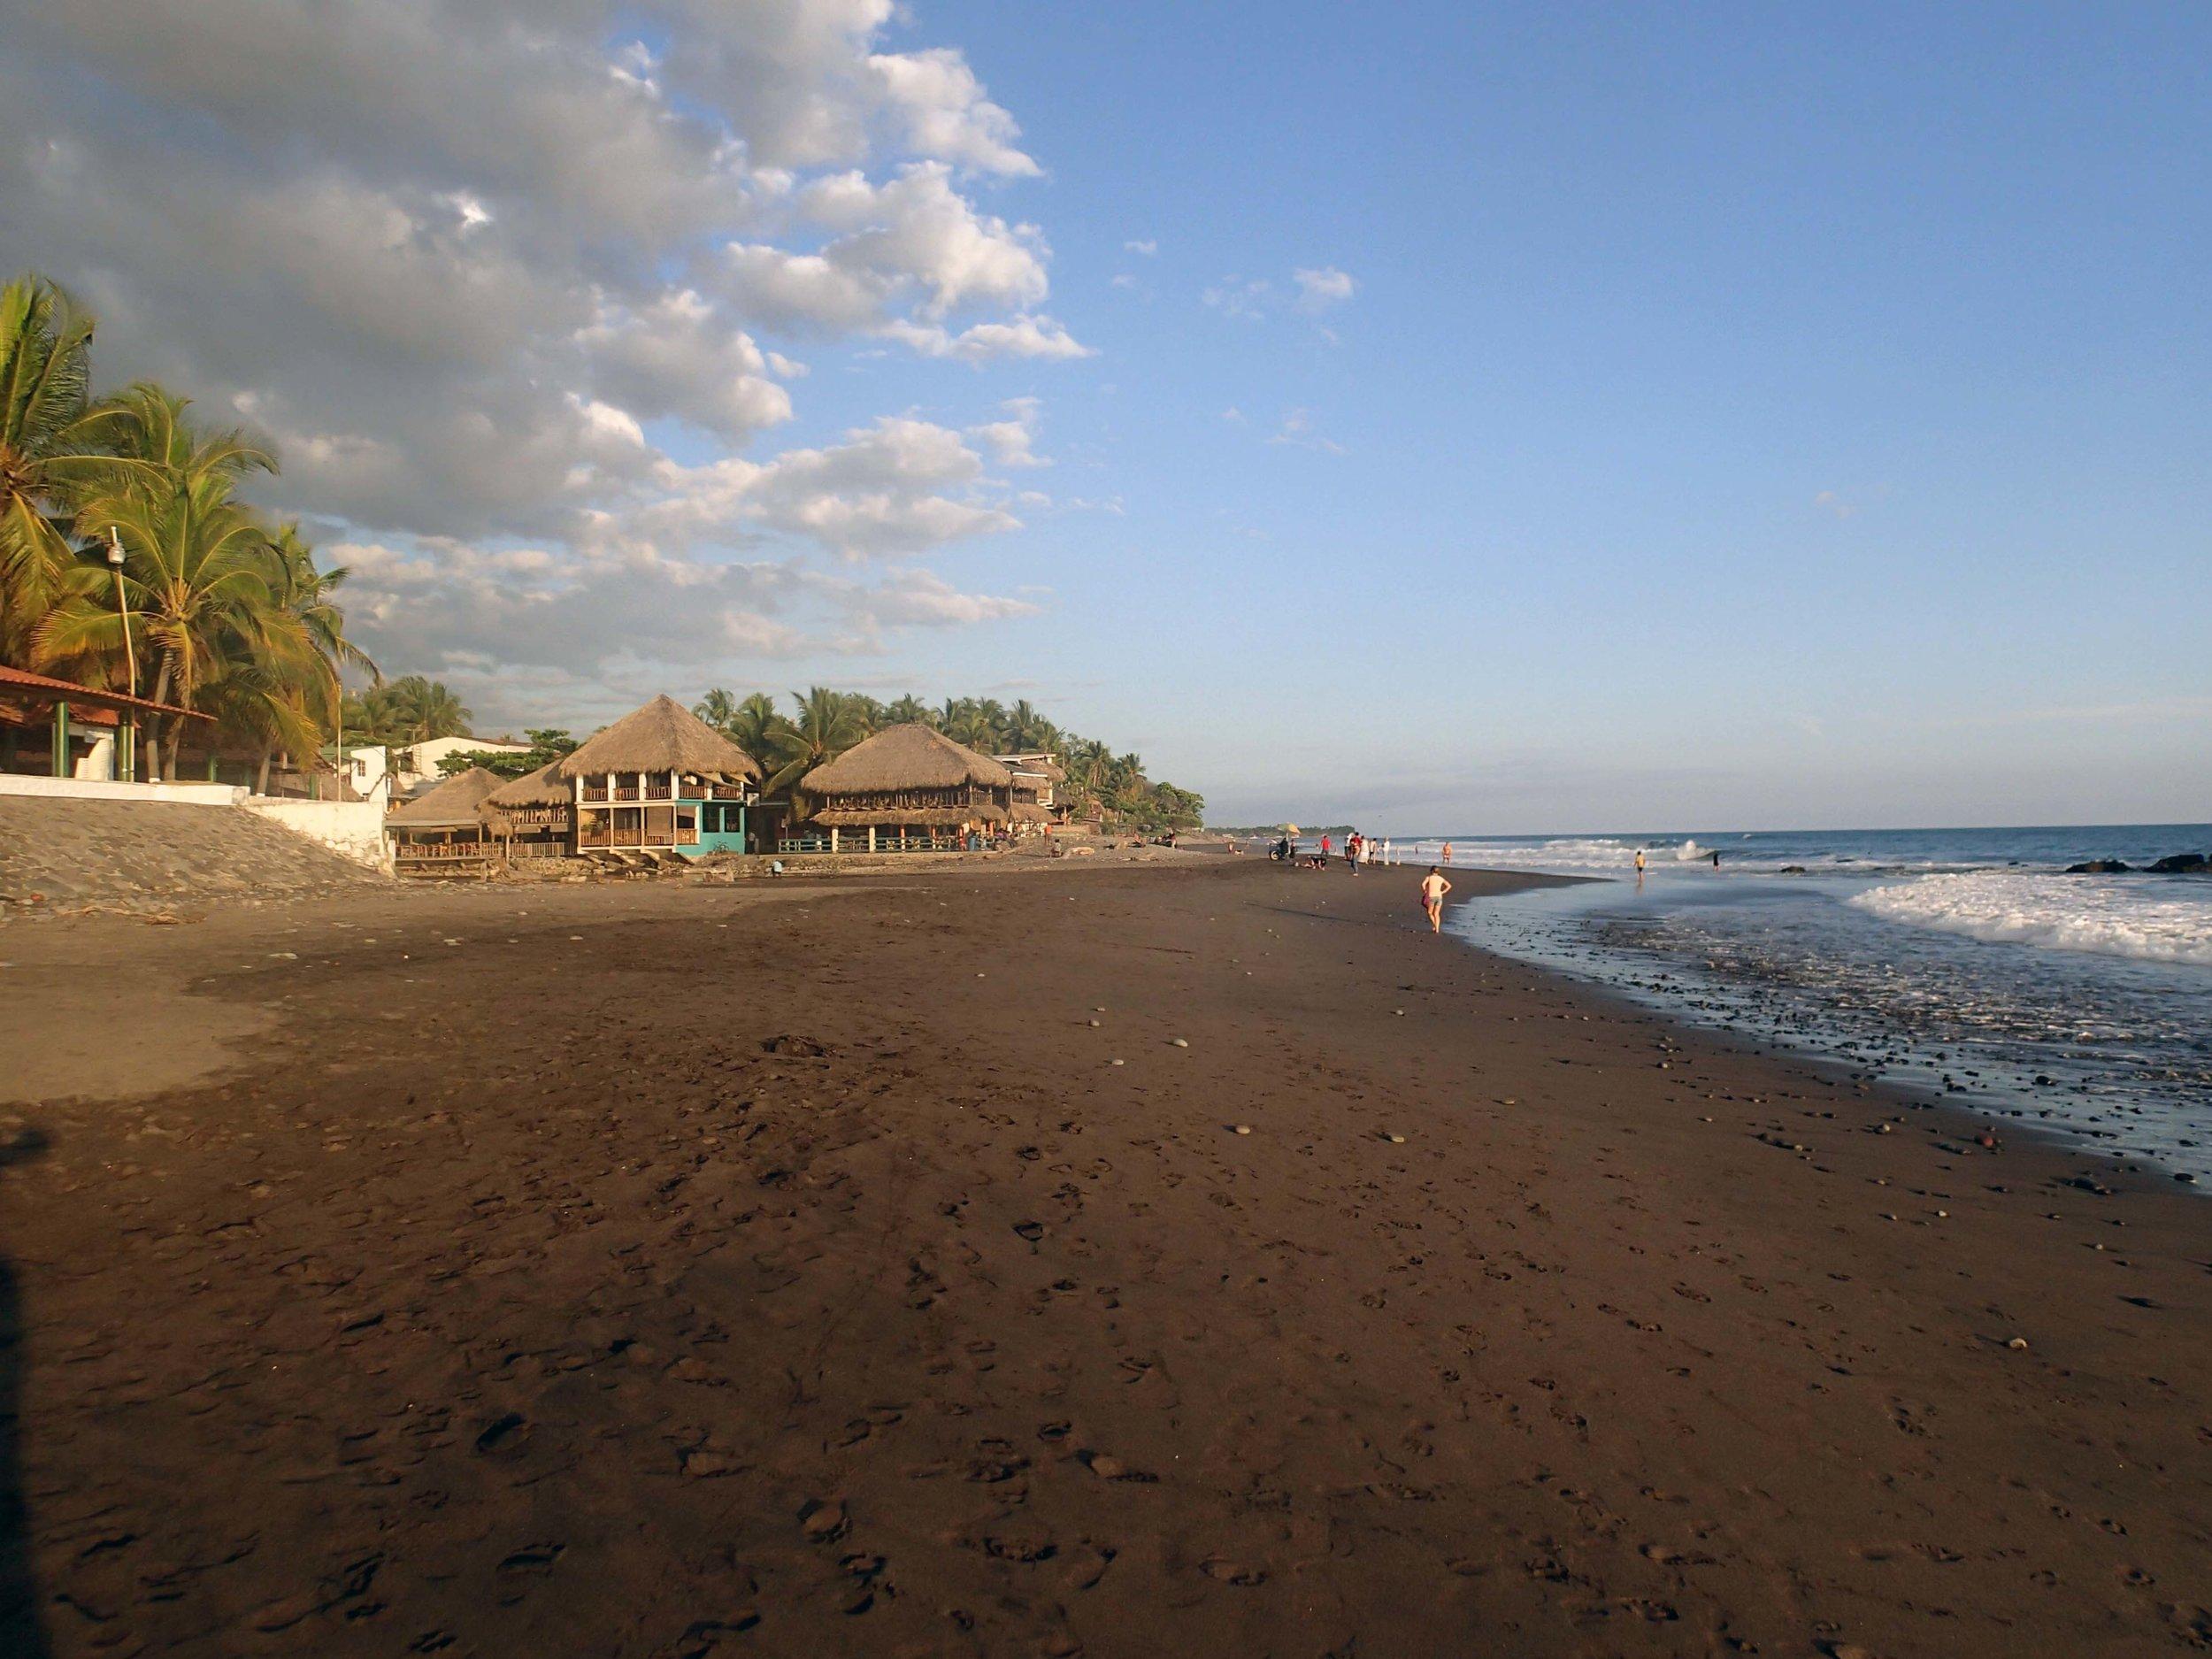 Playa El Tunco 12-5-14.jpg